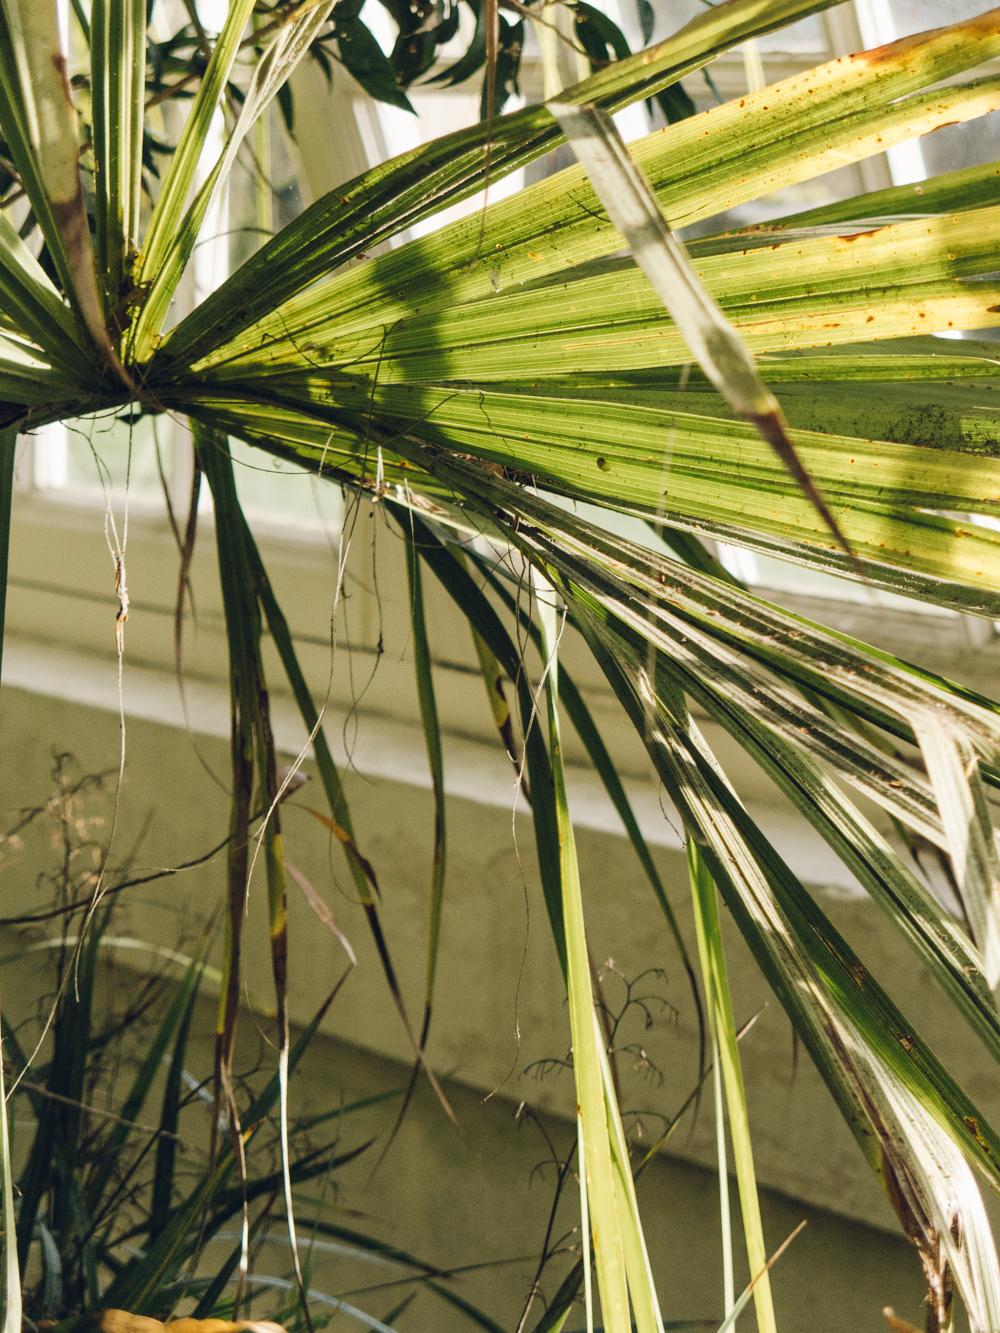 Haarkon Sheffield Botanical Gardens Pavilion Glasshouse Greenhouse Victorian Plants Greenery Park